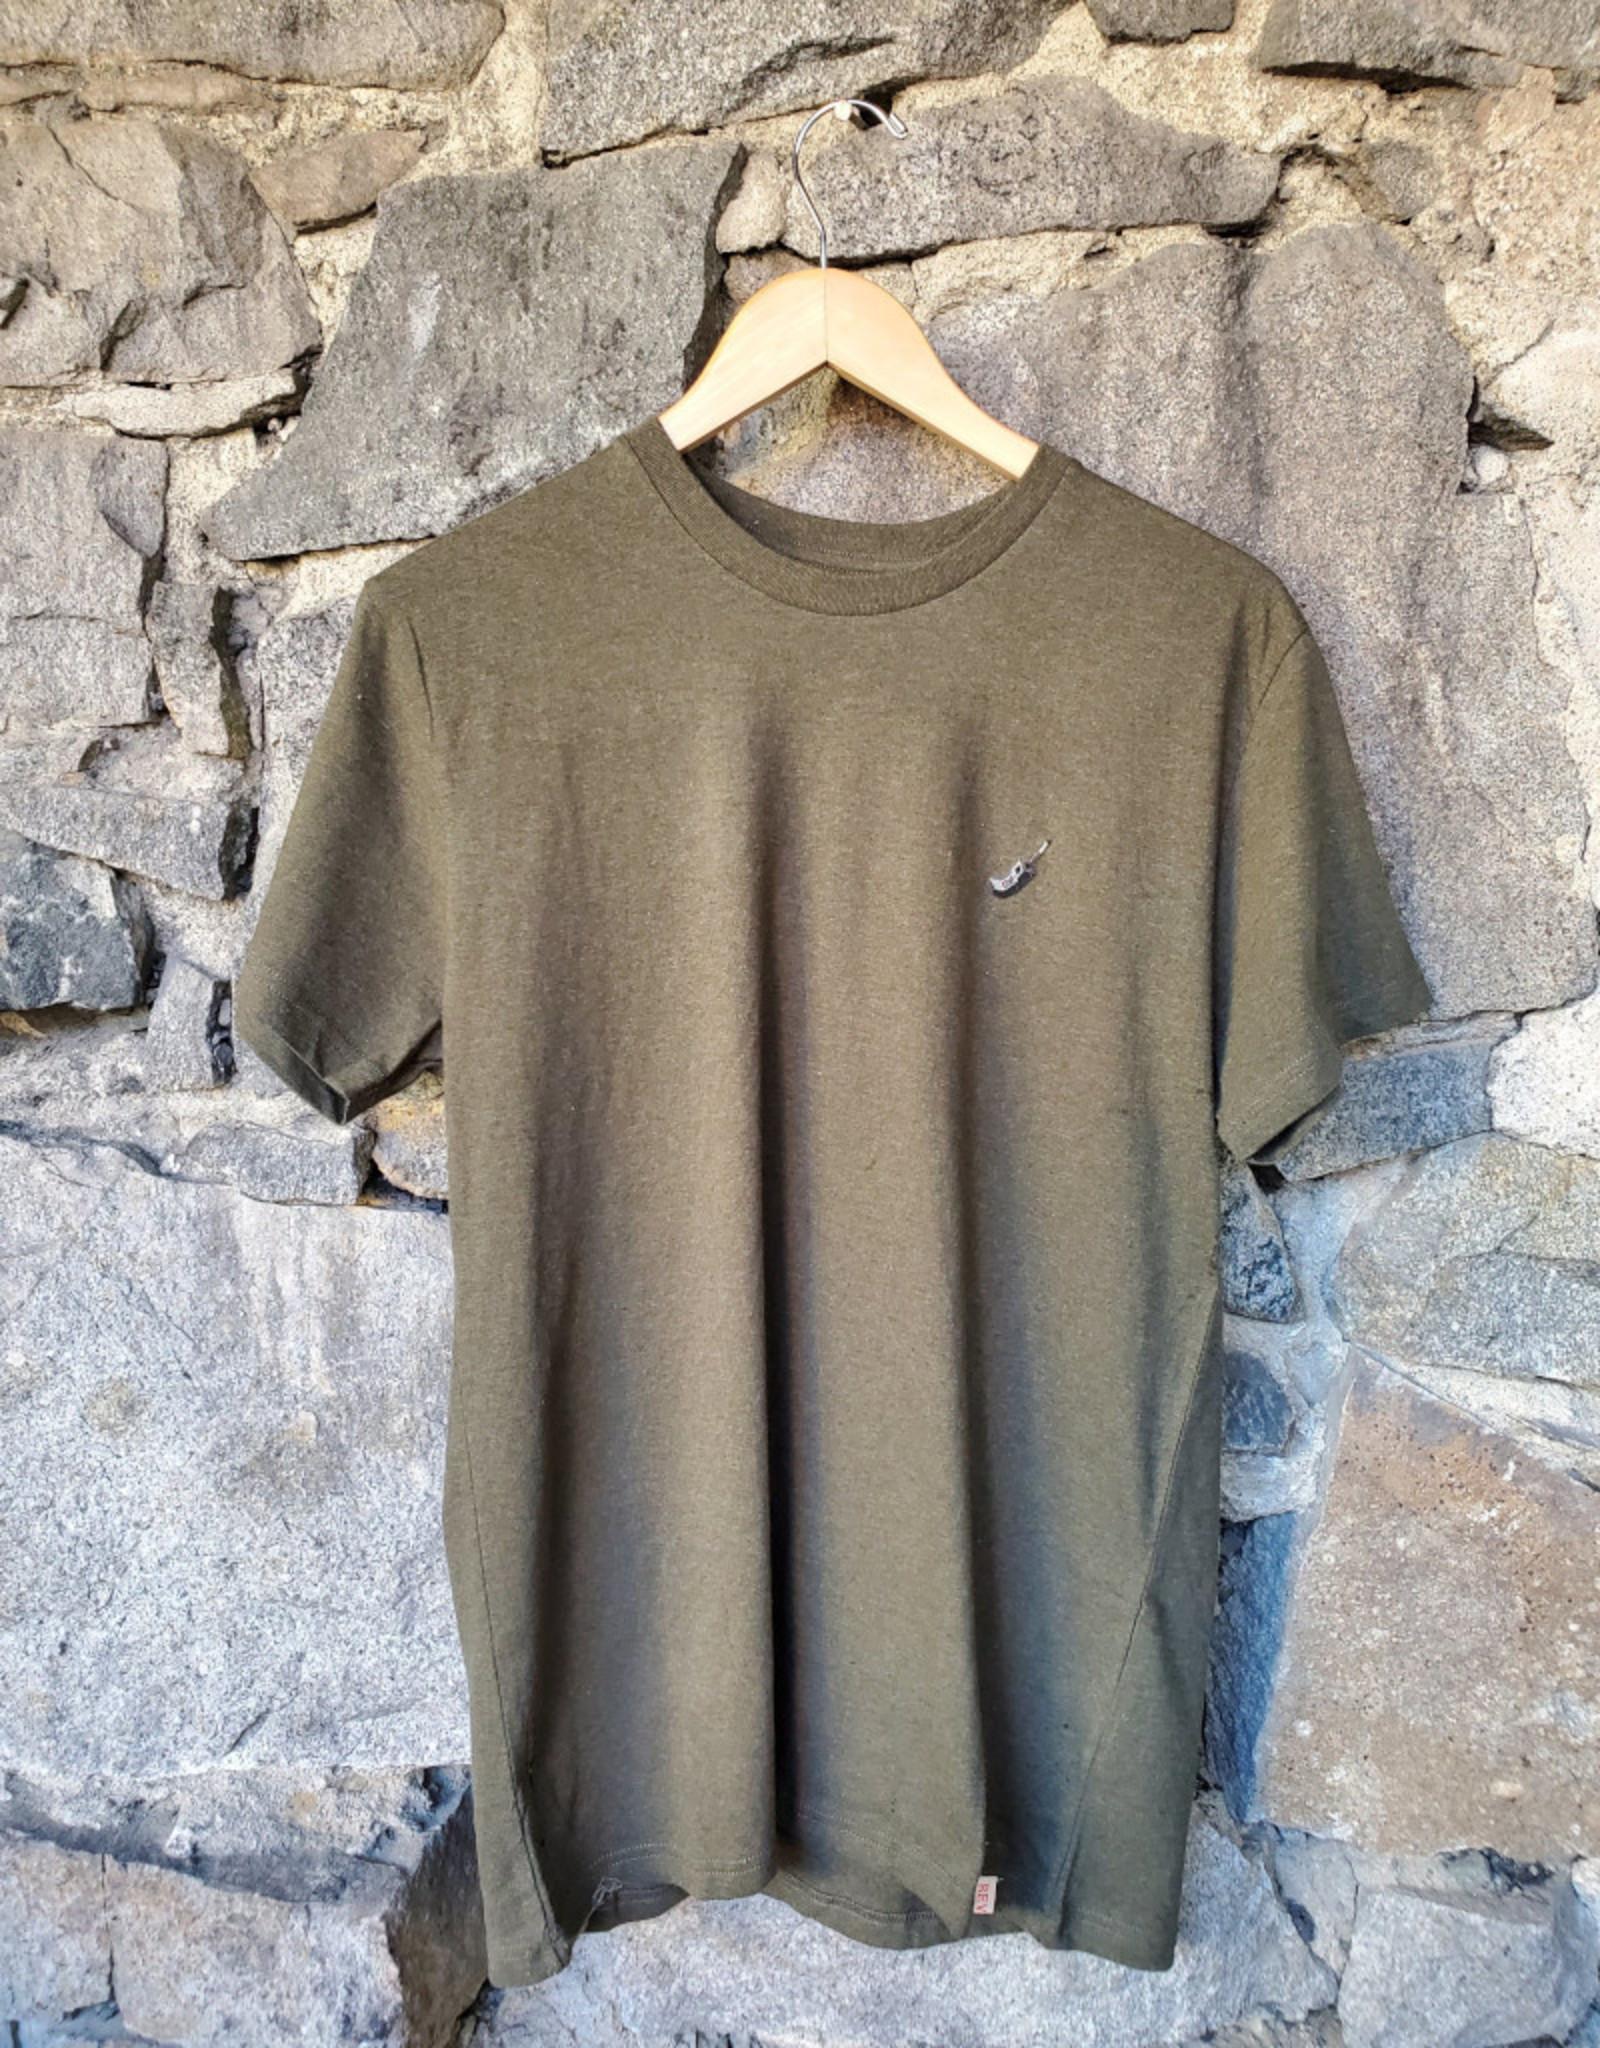 RVLT 1198 CEL Application T-Shirt - Army-Melange